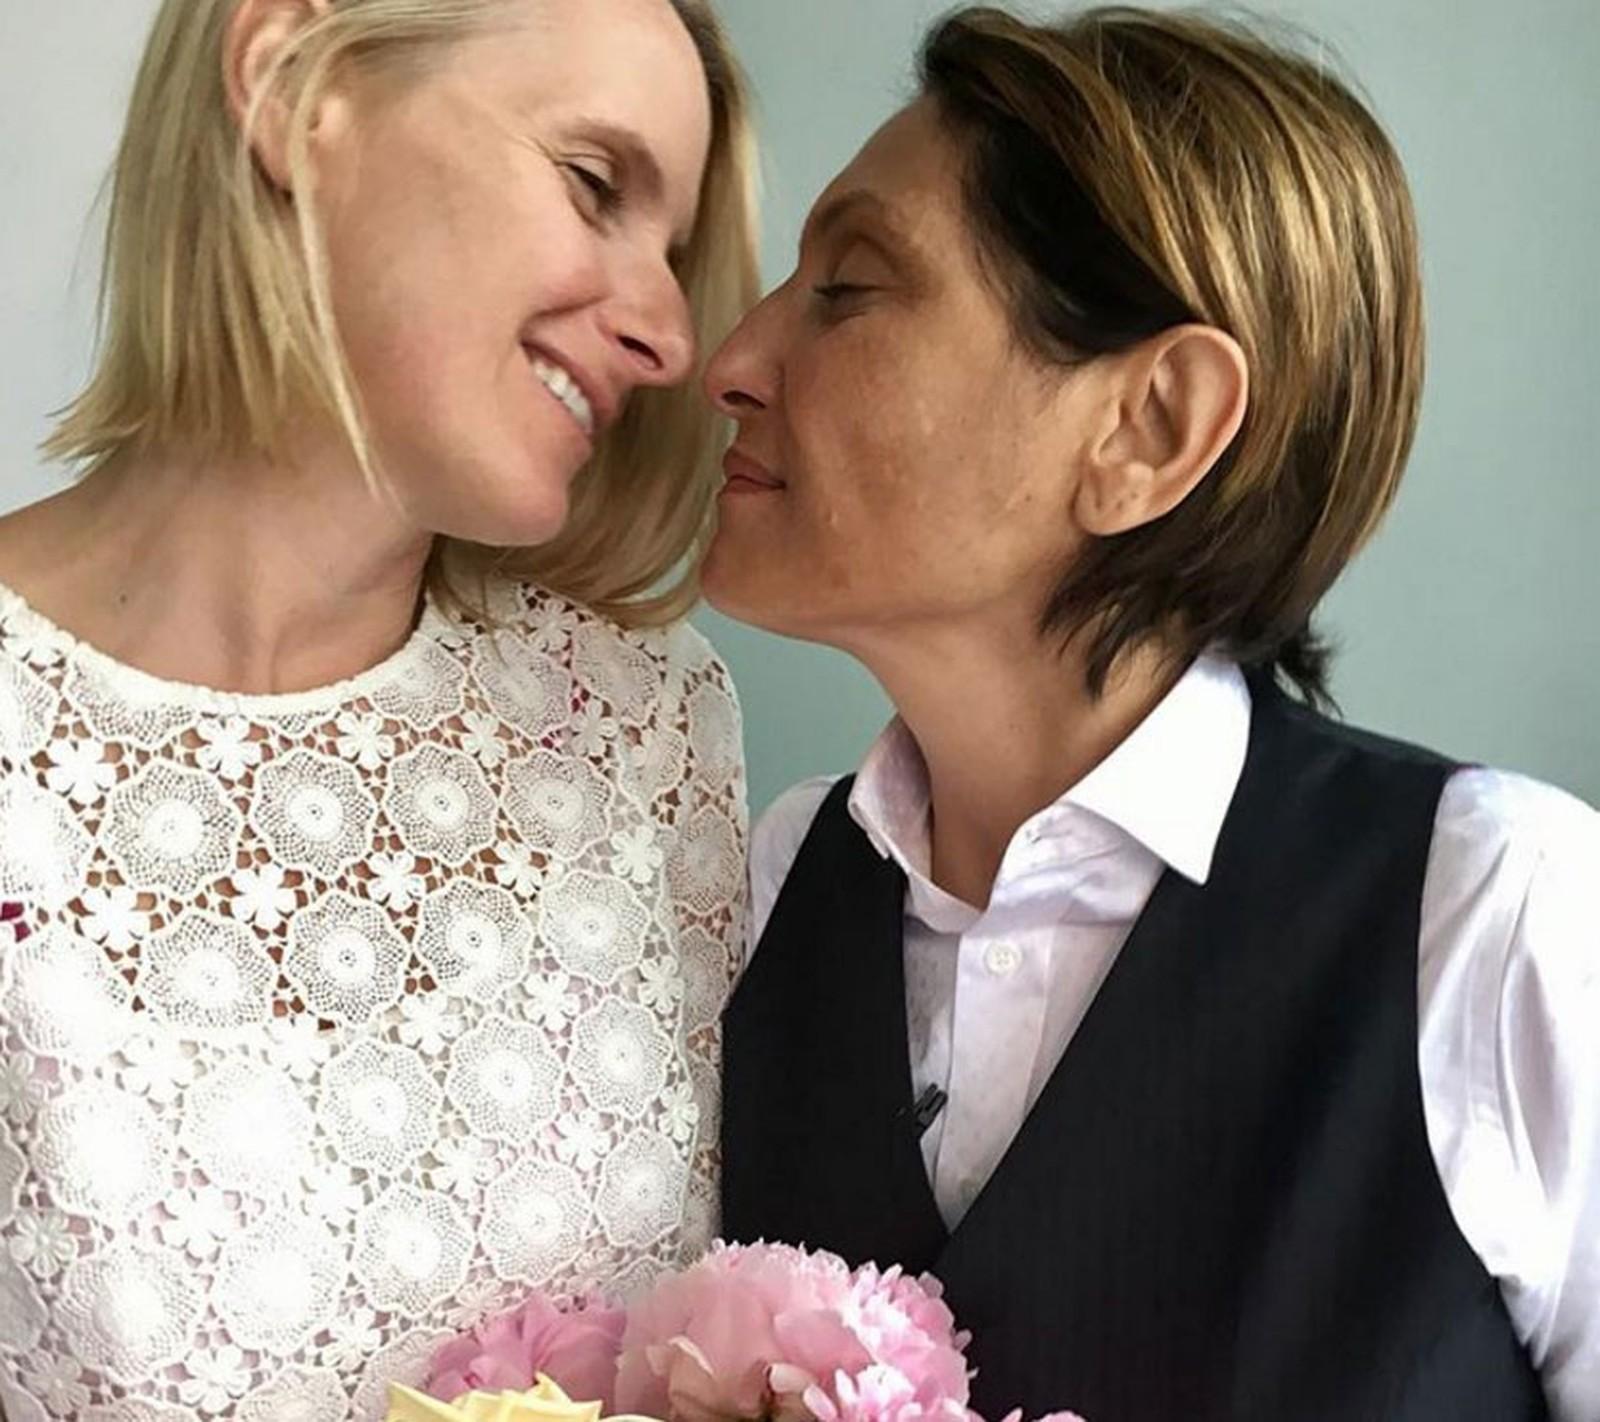 Morre aos 57 anos escritora Rayya Elias, esposa da autora de 'Comer, rezar, amar'